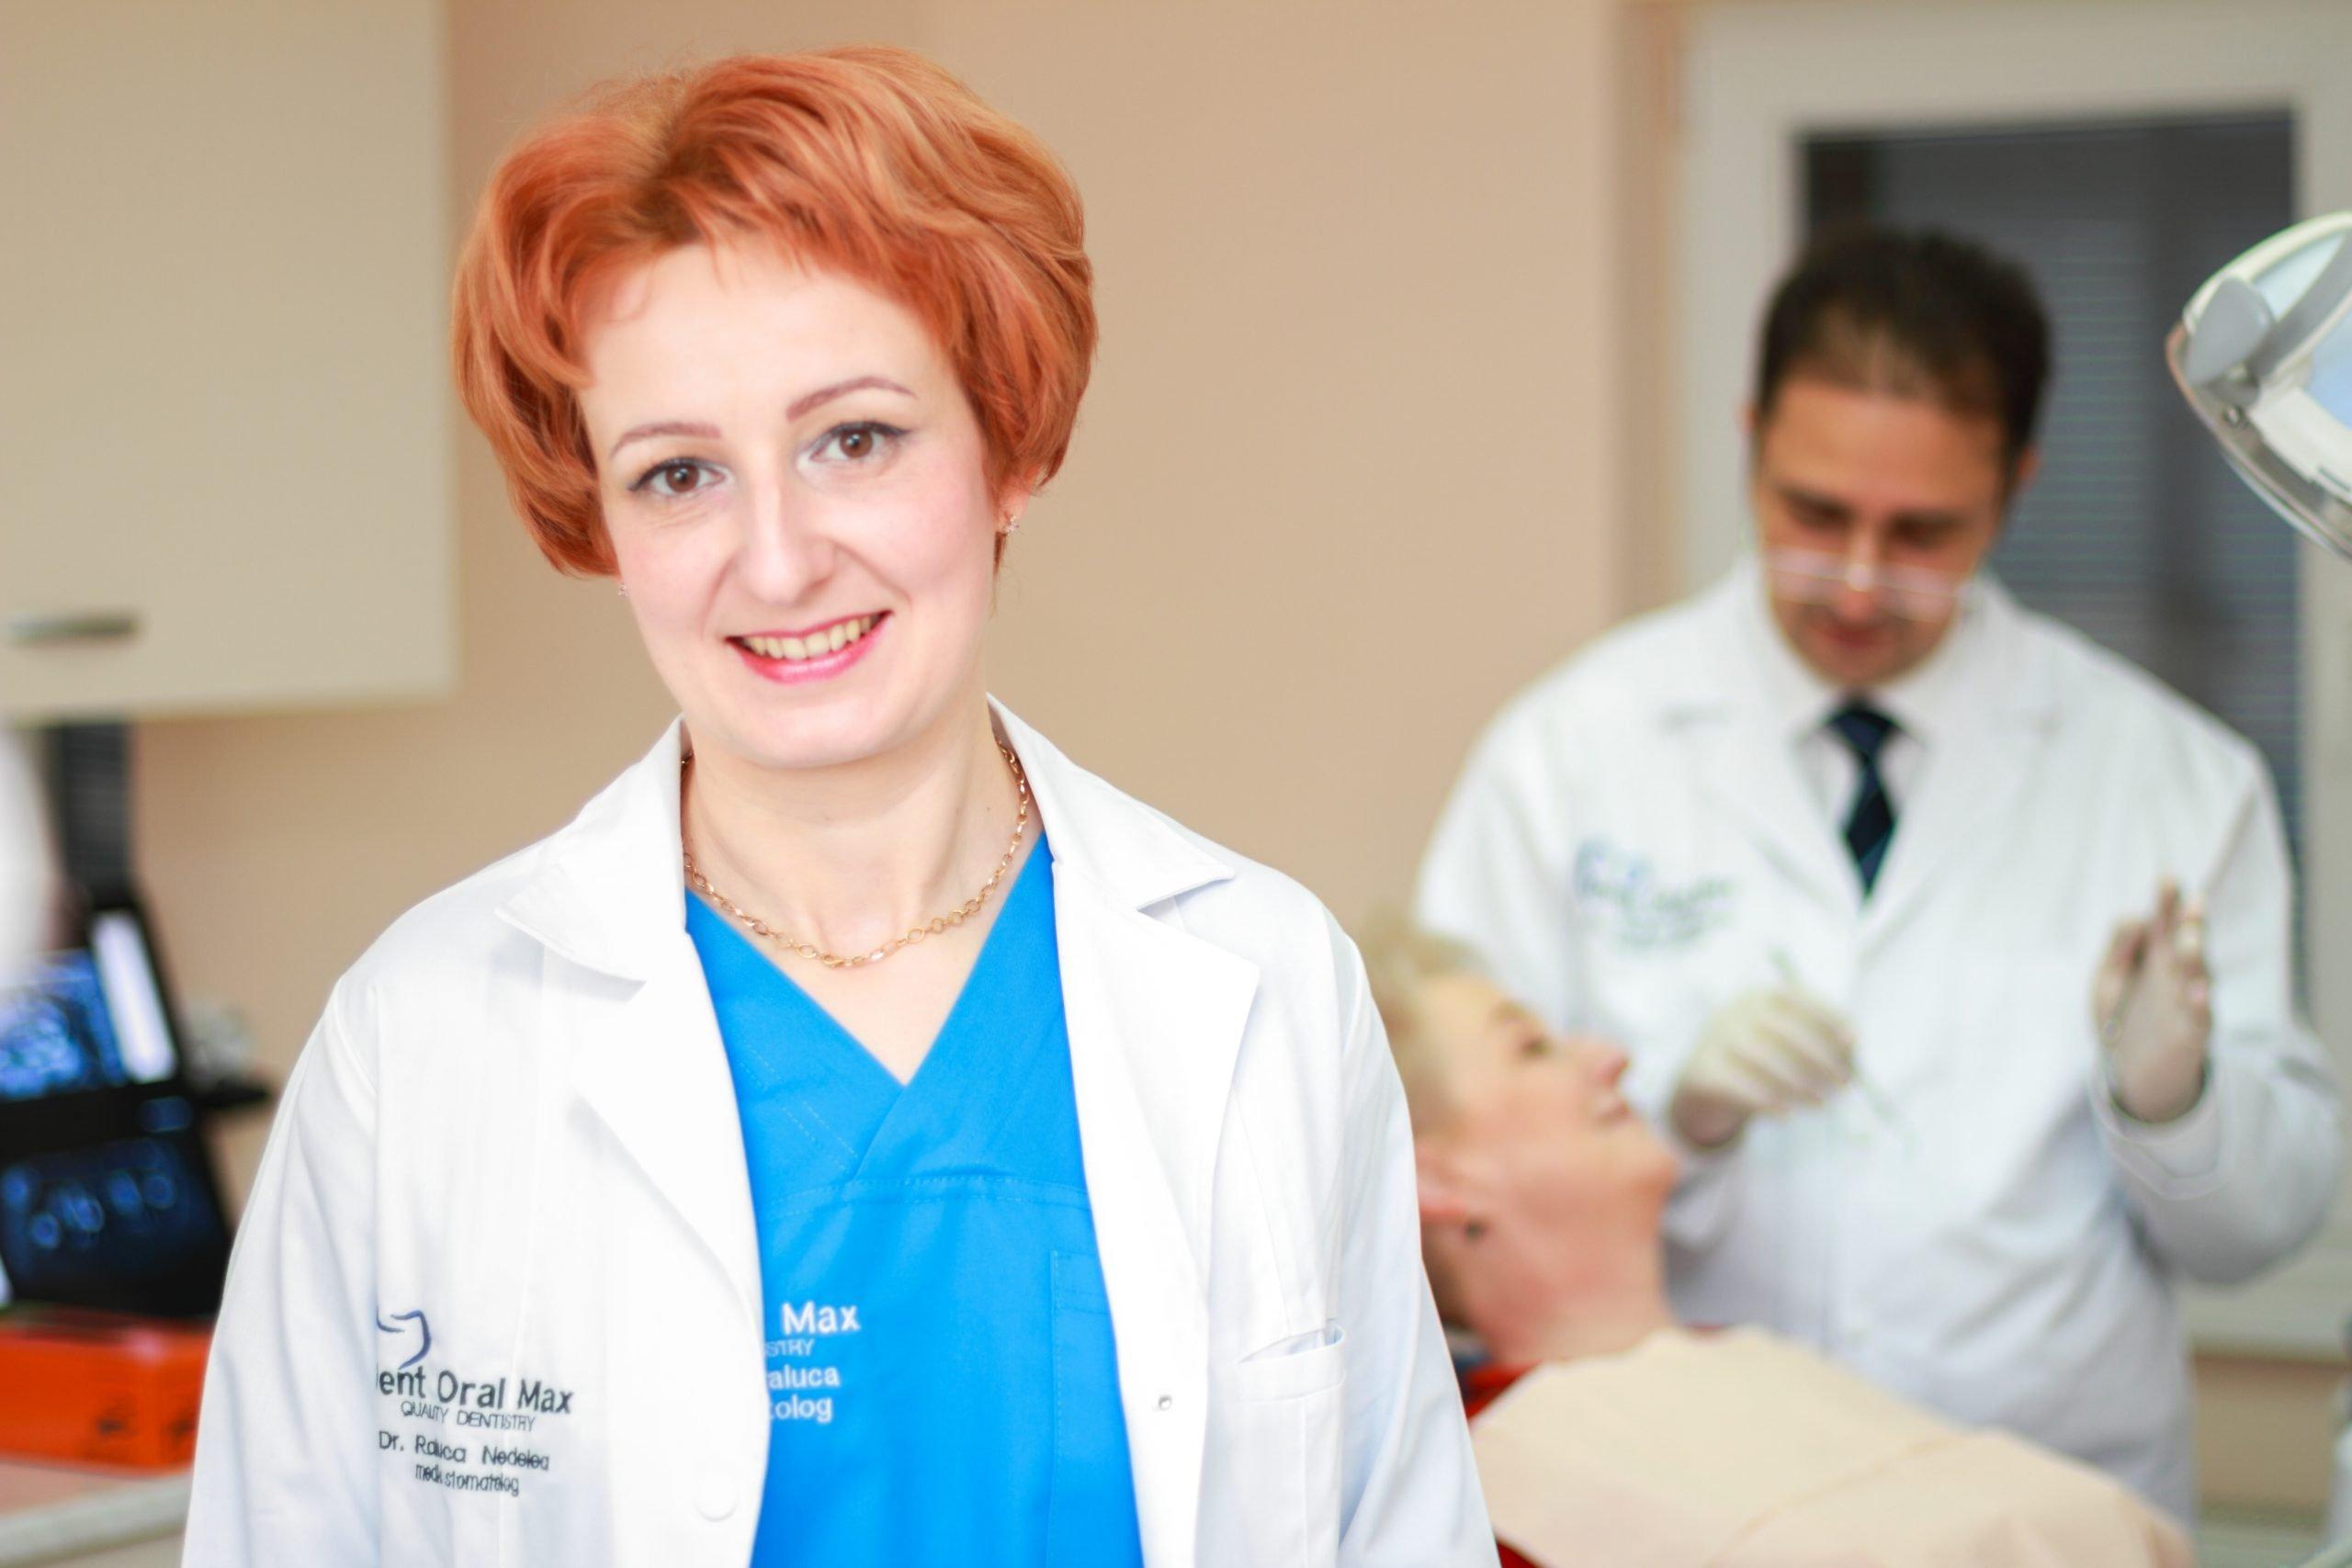 Cabinetul stomatologic Dent Oral Max